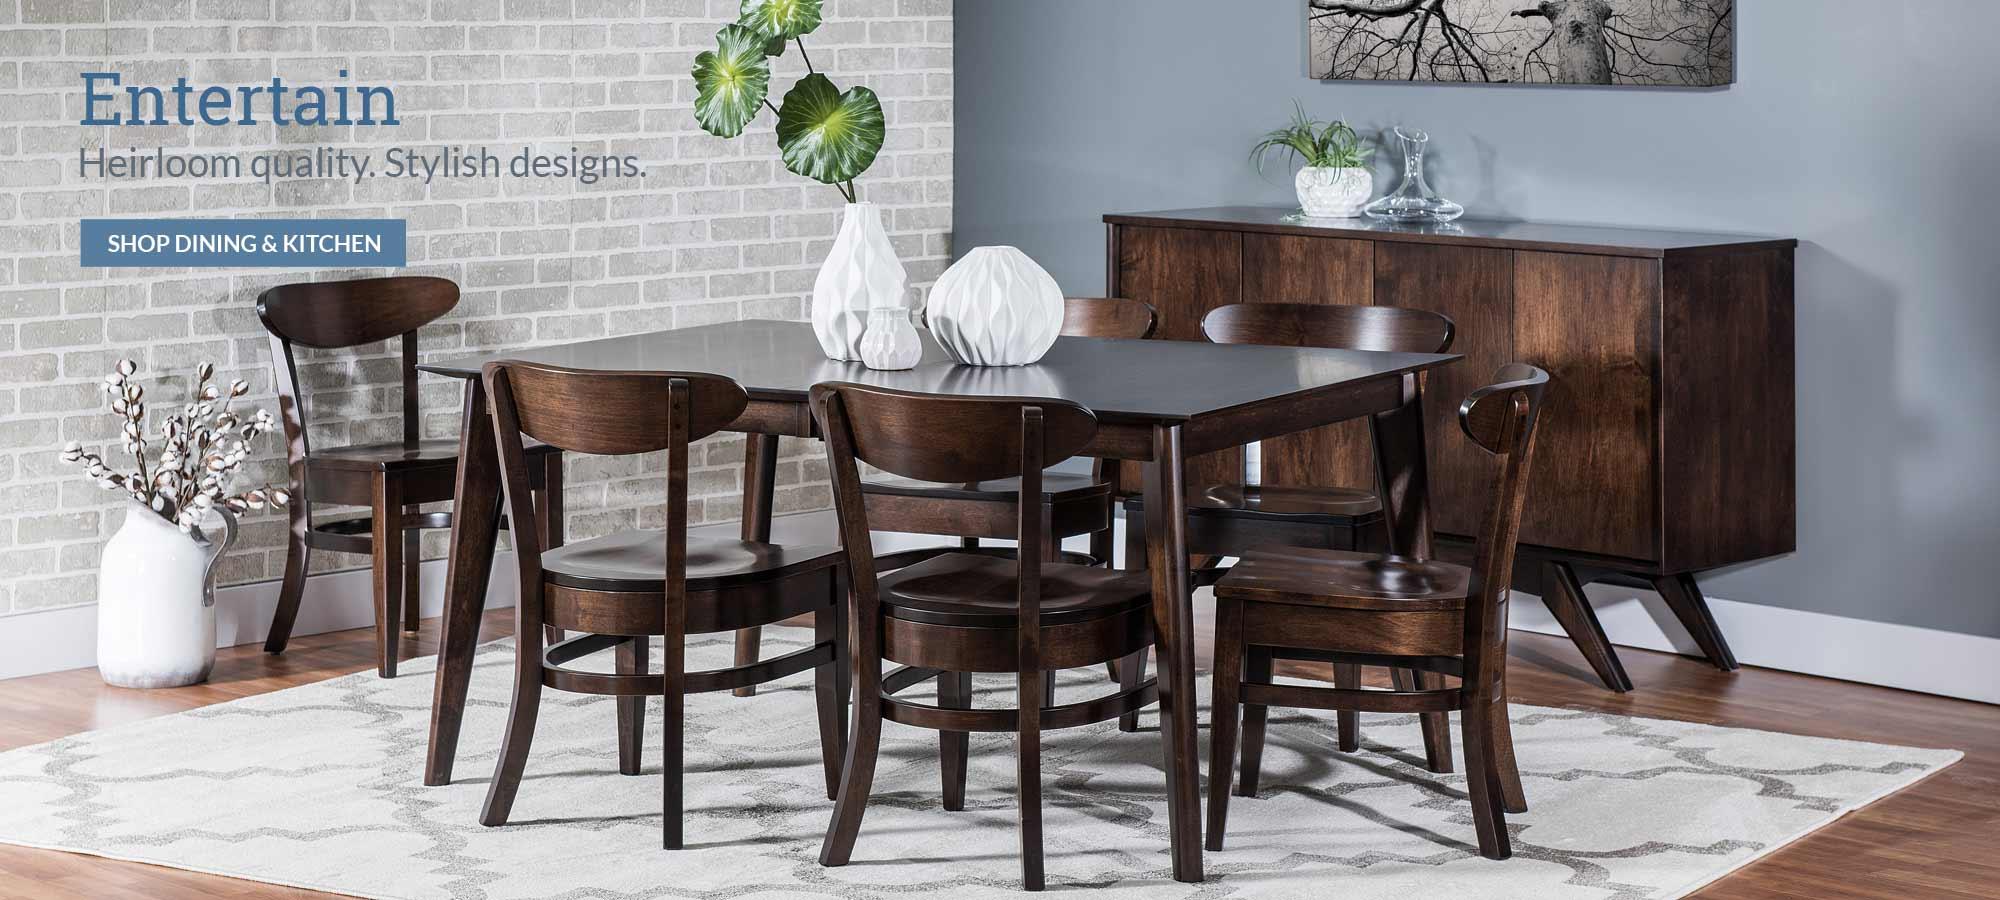 Mattie Lu - Custom Solid Wood Dining Furniture